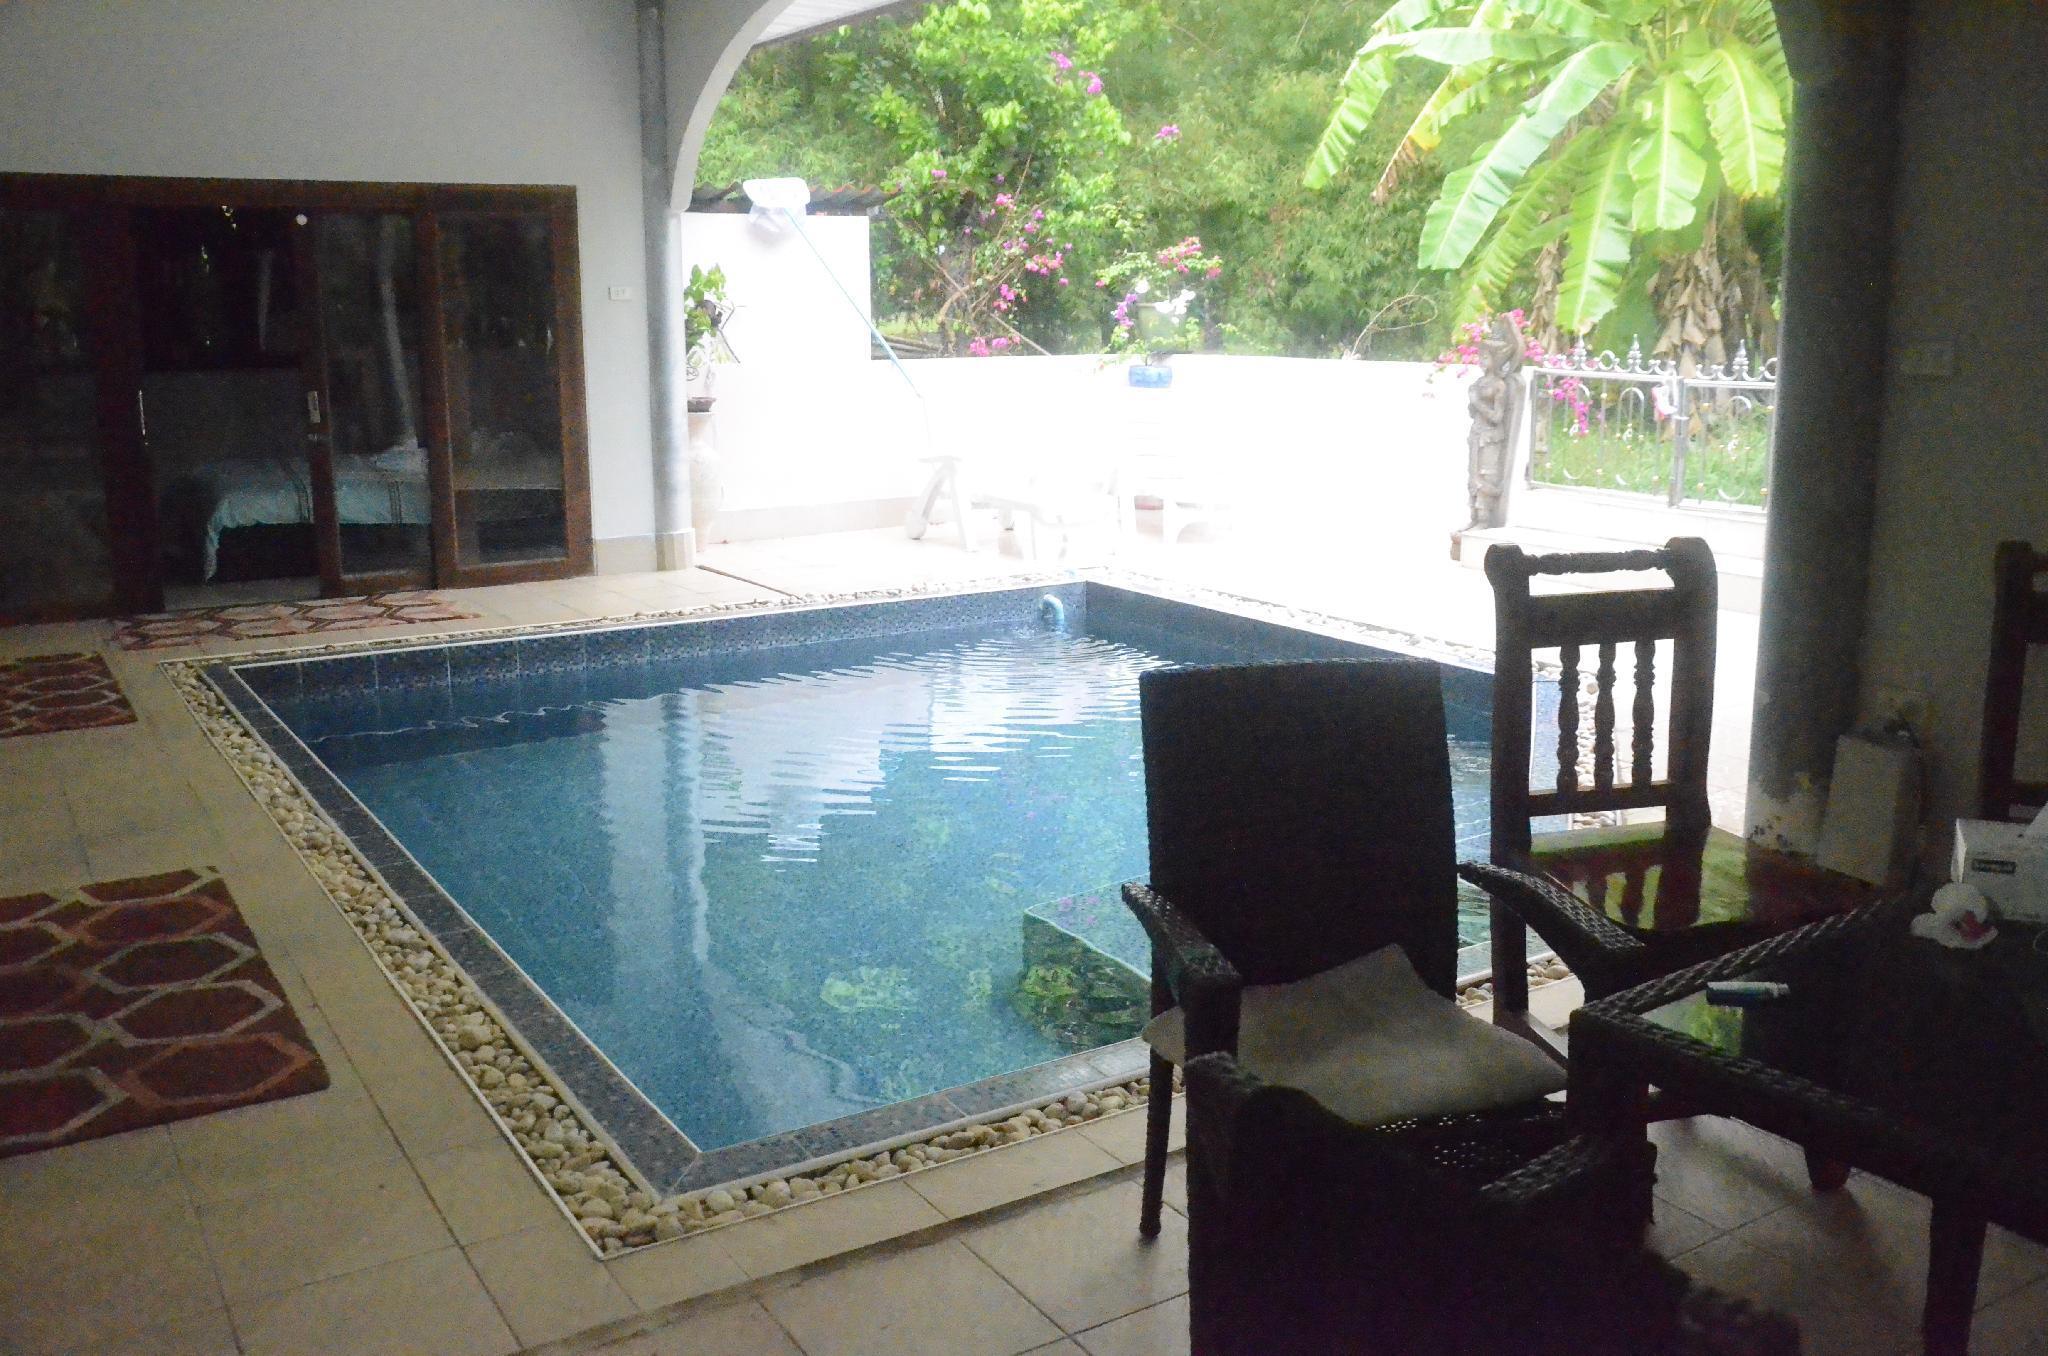 3 BDR Luxury Private Swimming Pool Villa Ban kai วิลลา 3 ห้องนอน 3 ห้องน้ำส่วนตัว ขนาด 300 ตร.ม. – บ้านใต้